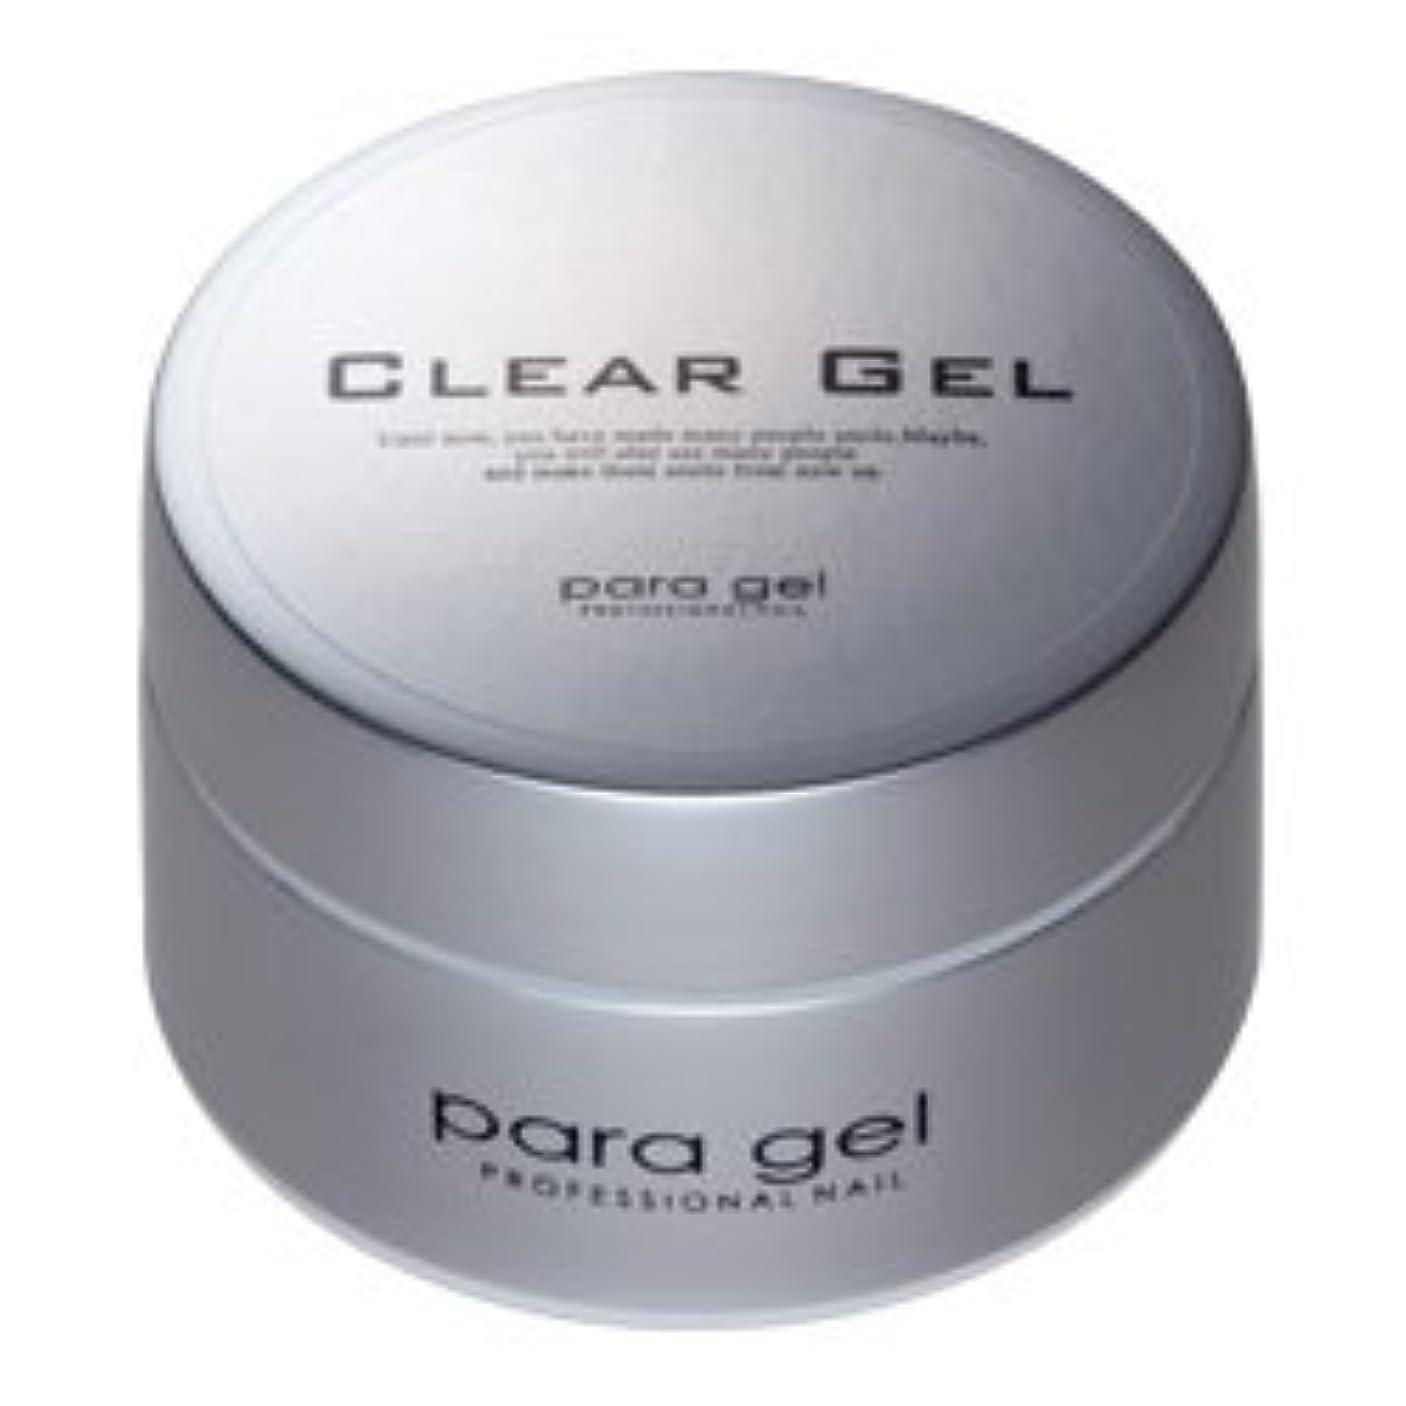 ★para gel(パラジェル) <BR>クリアジェル 10g